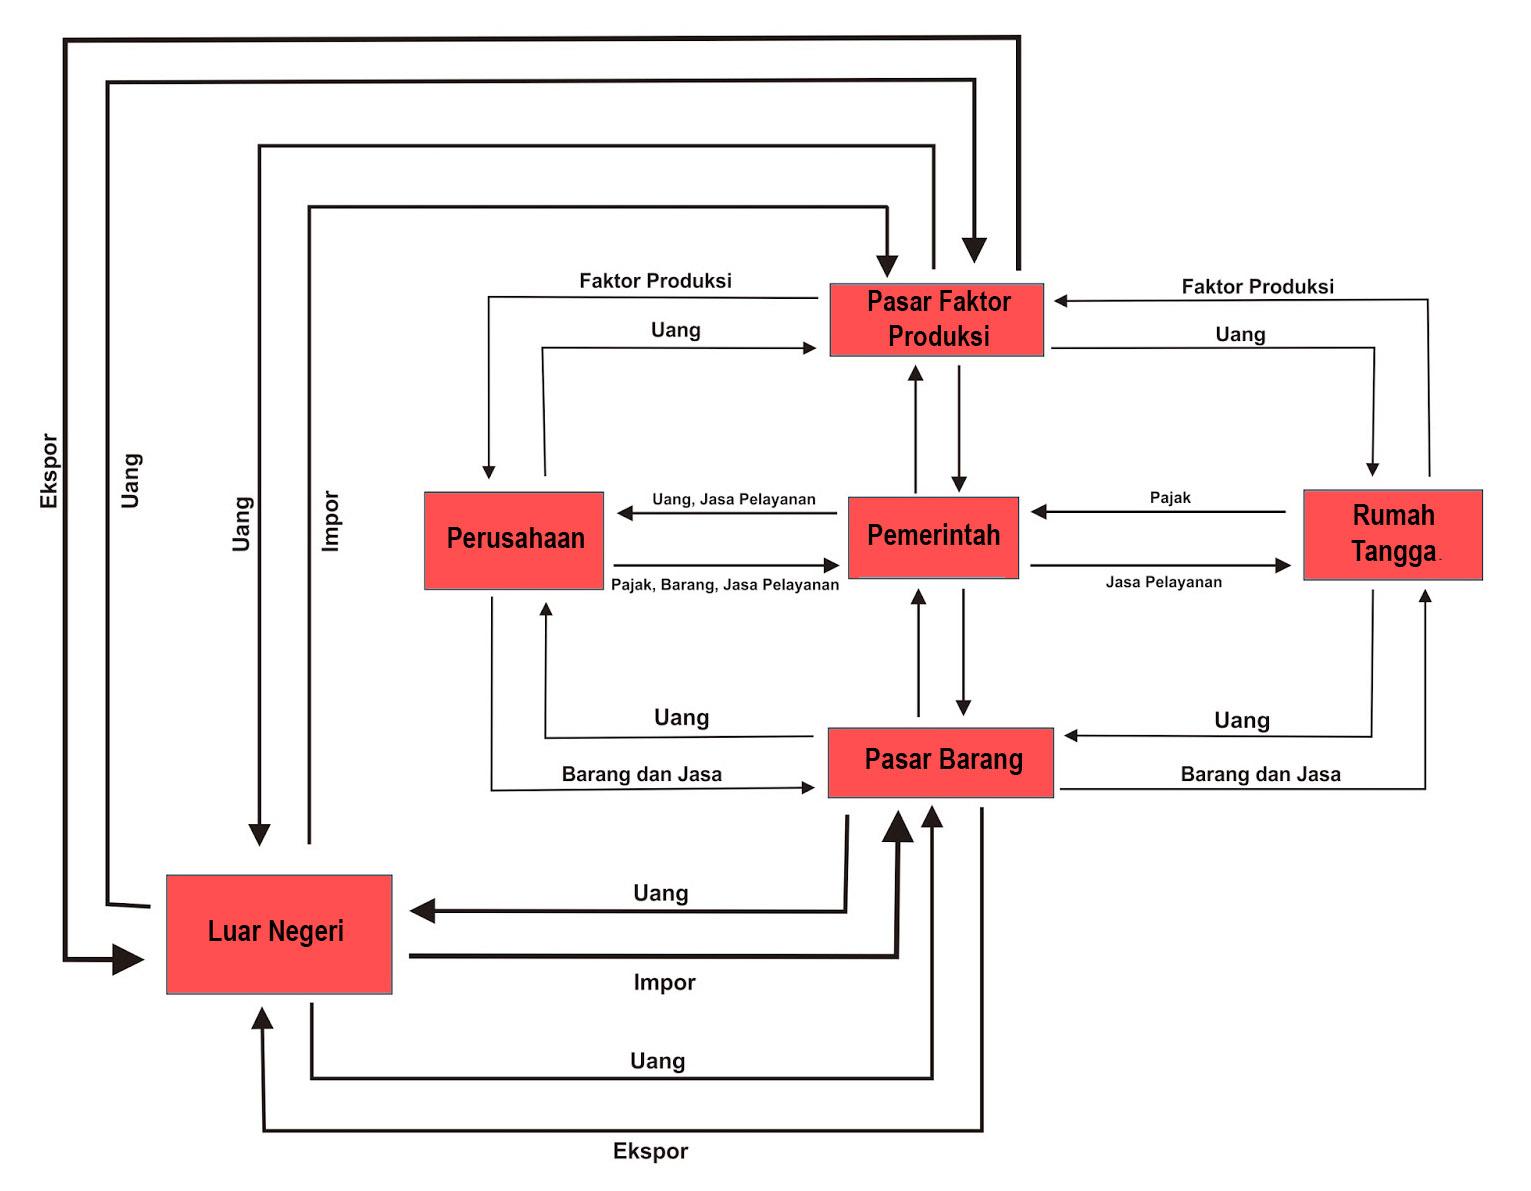 Diagram interaksi antar pelaku ekonomi pada perekonomian terbuka dan diagram interaksi pelaku ekonomi 4 sektor ccuart Image collections